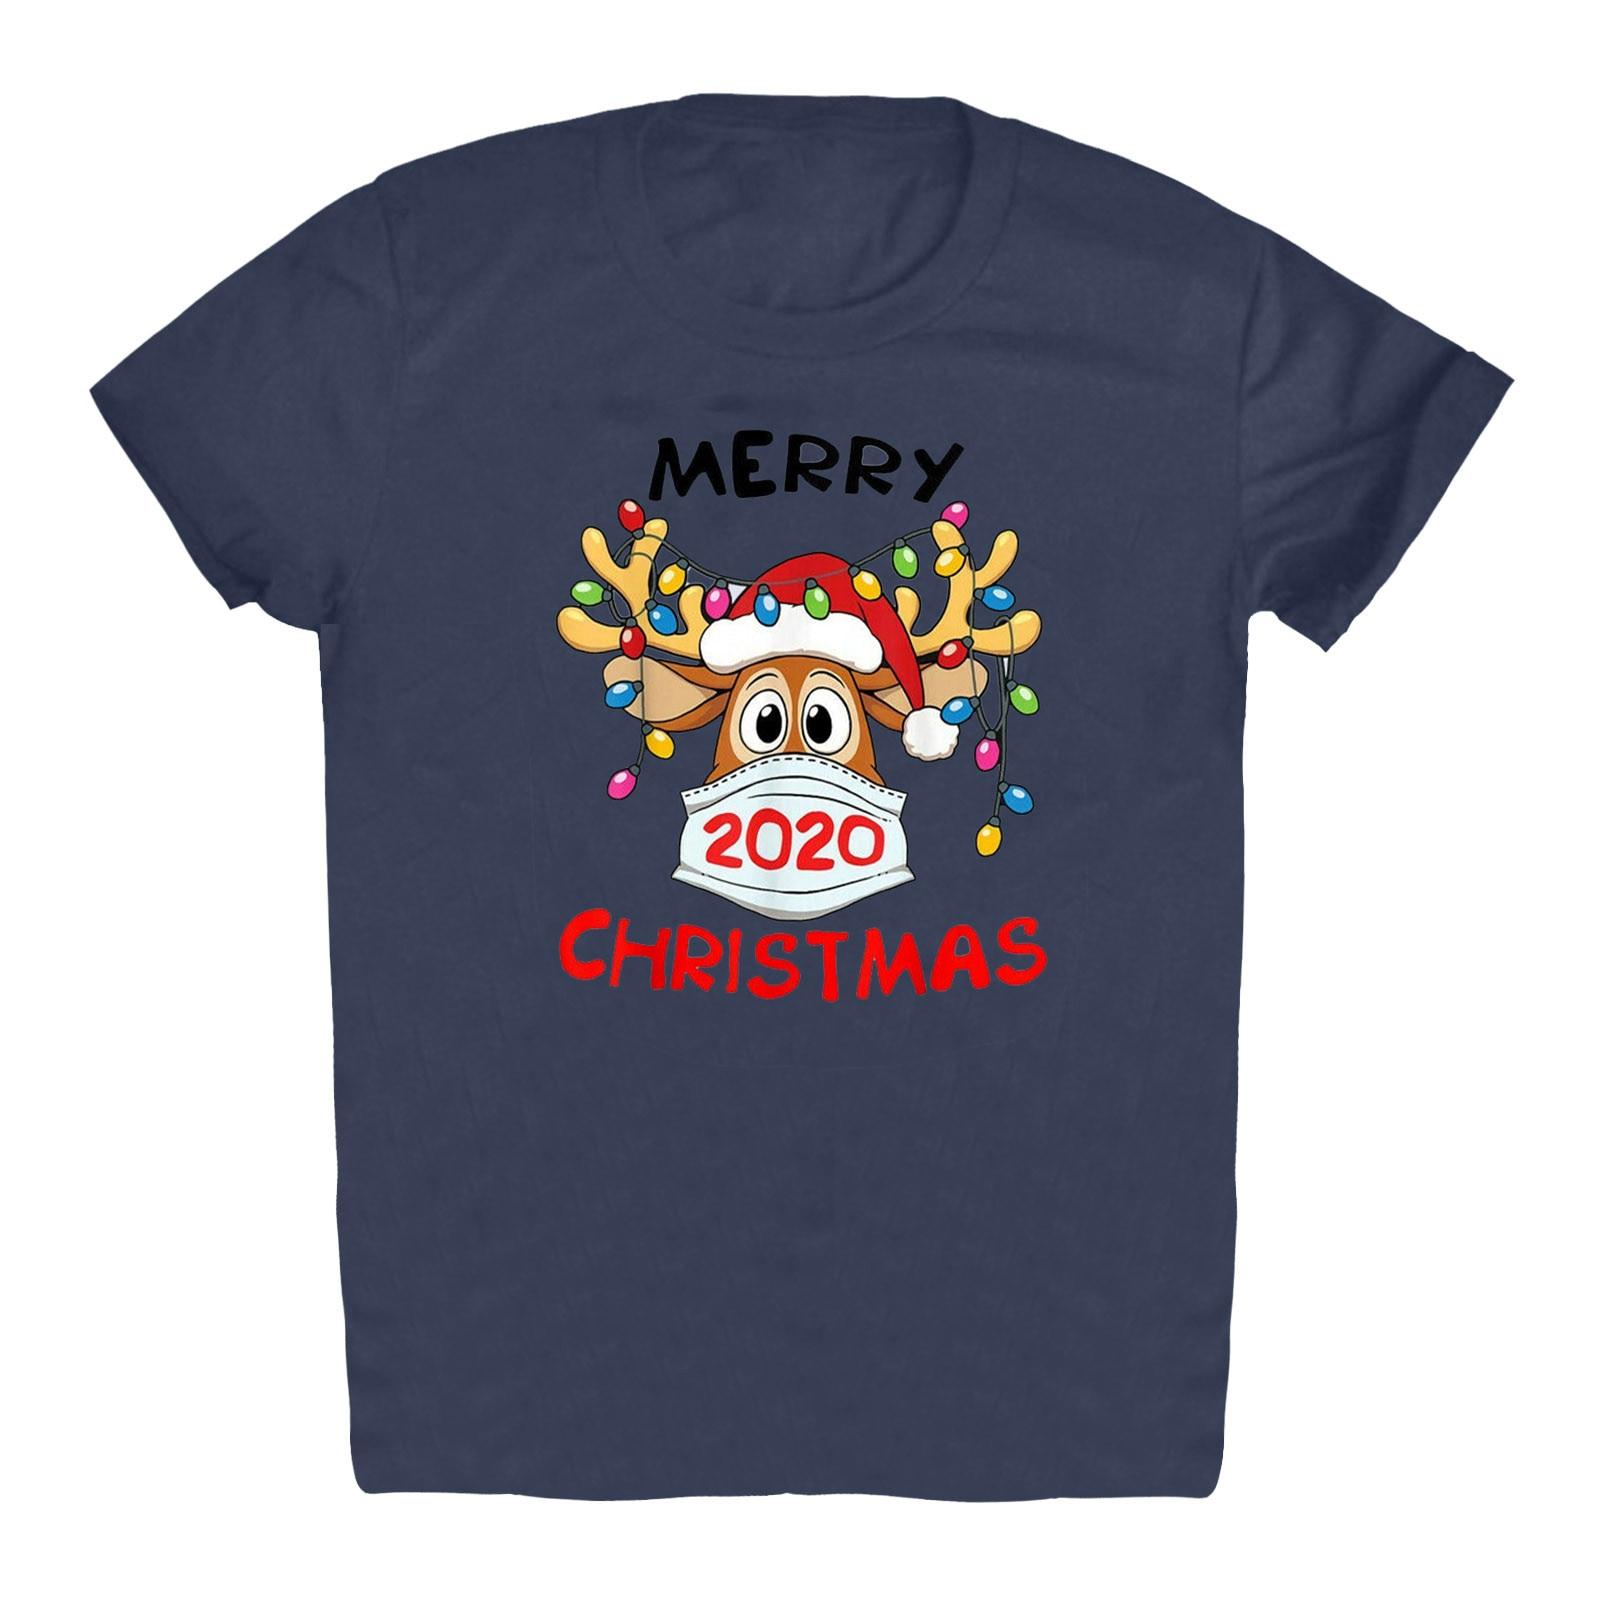 Christmas Women Short Sleeve Casual T-Shirt Santa Snowflake Funny Print Tops for women summer женские футболки футболка